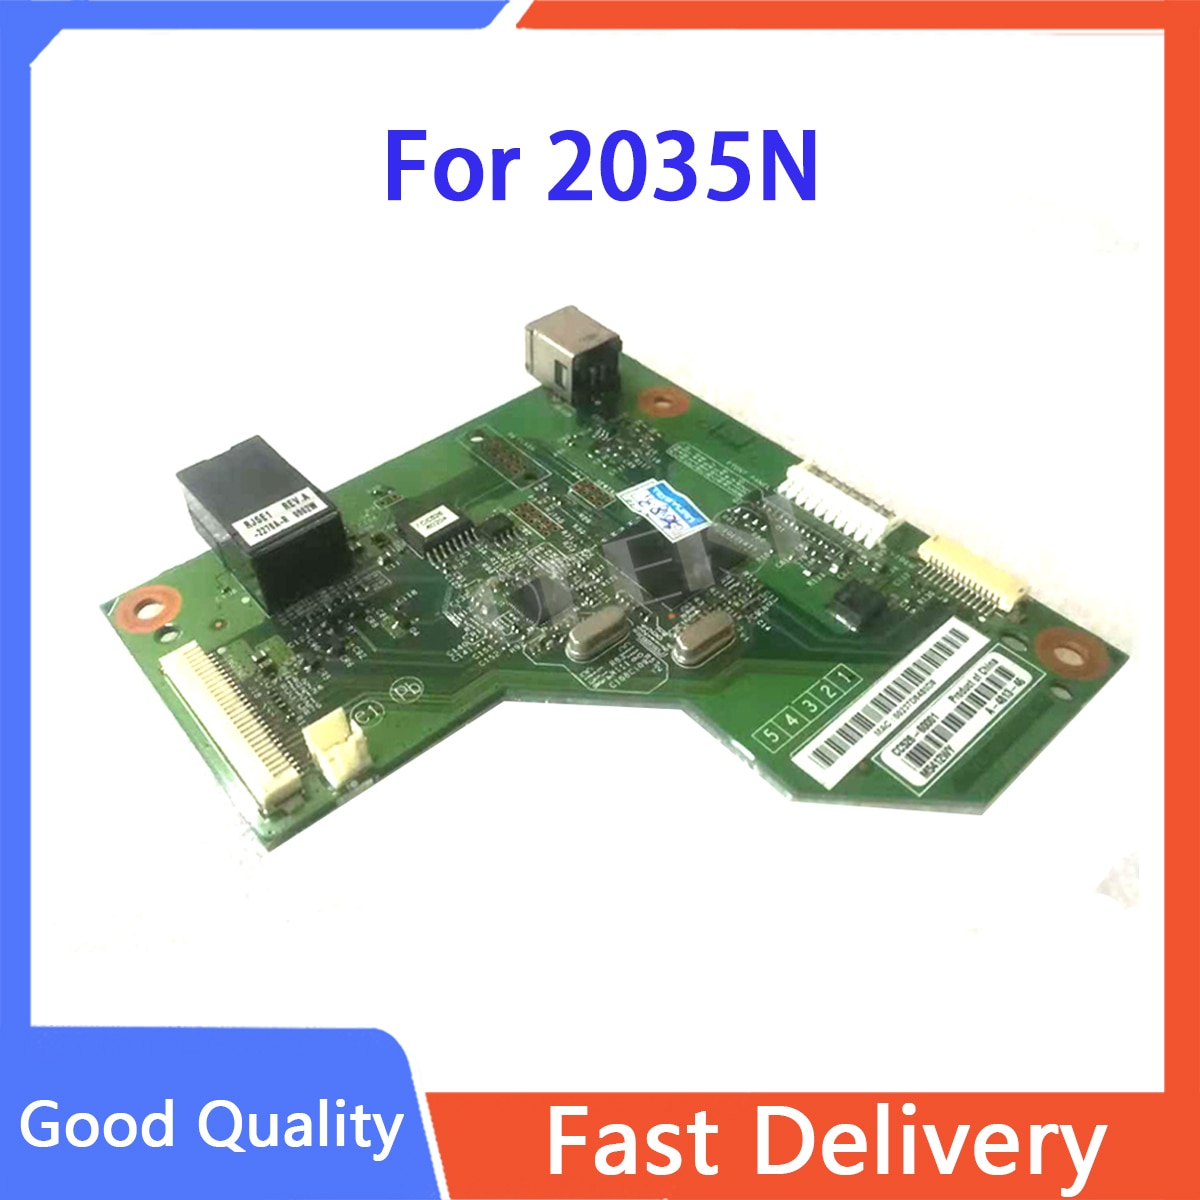 Original CC526-60001 Formatter Board PCA ASSY logic Main Board MainBoard mother board for HP Laserjet P2035N p2035 printer parts недорого